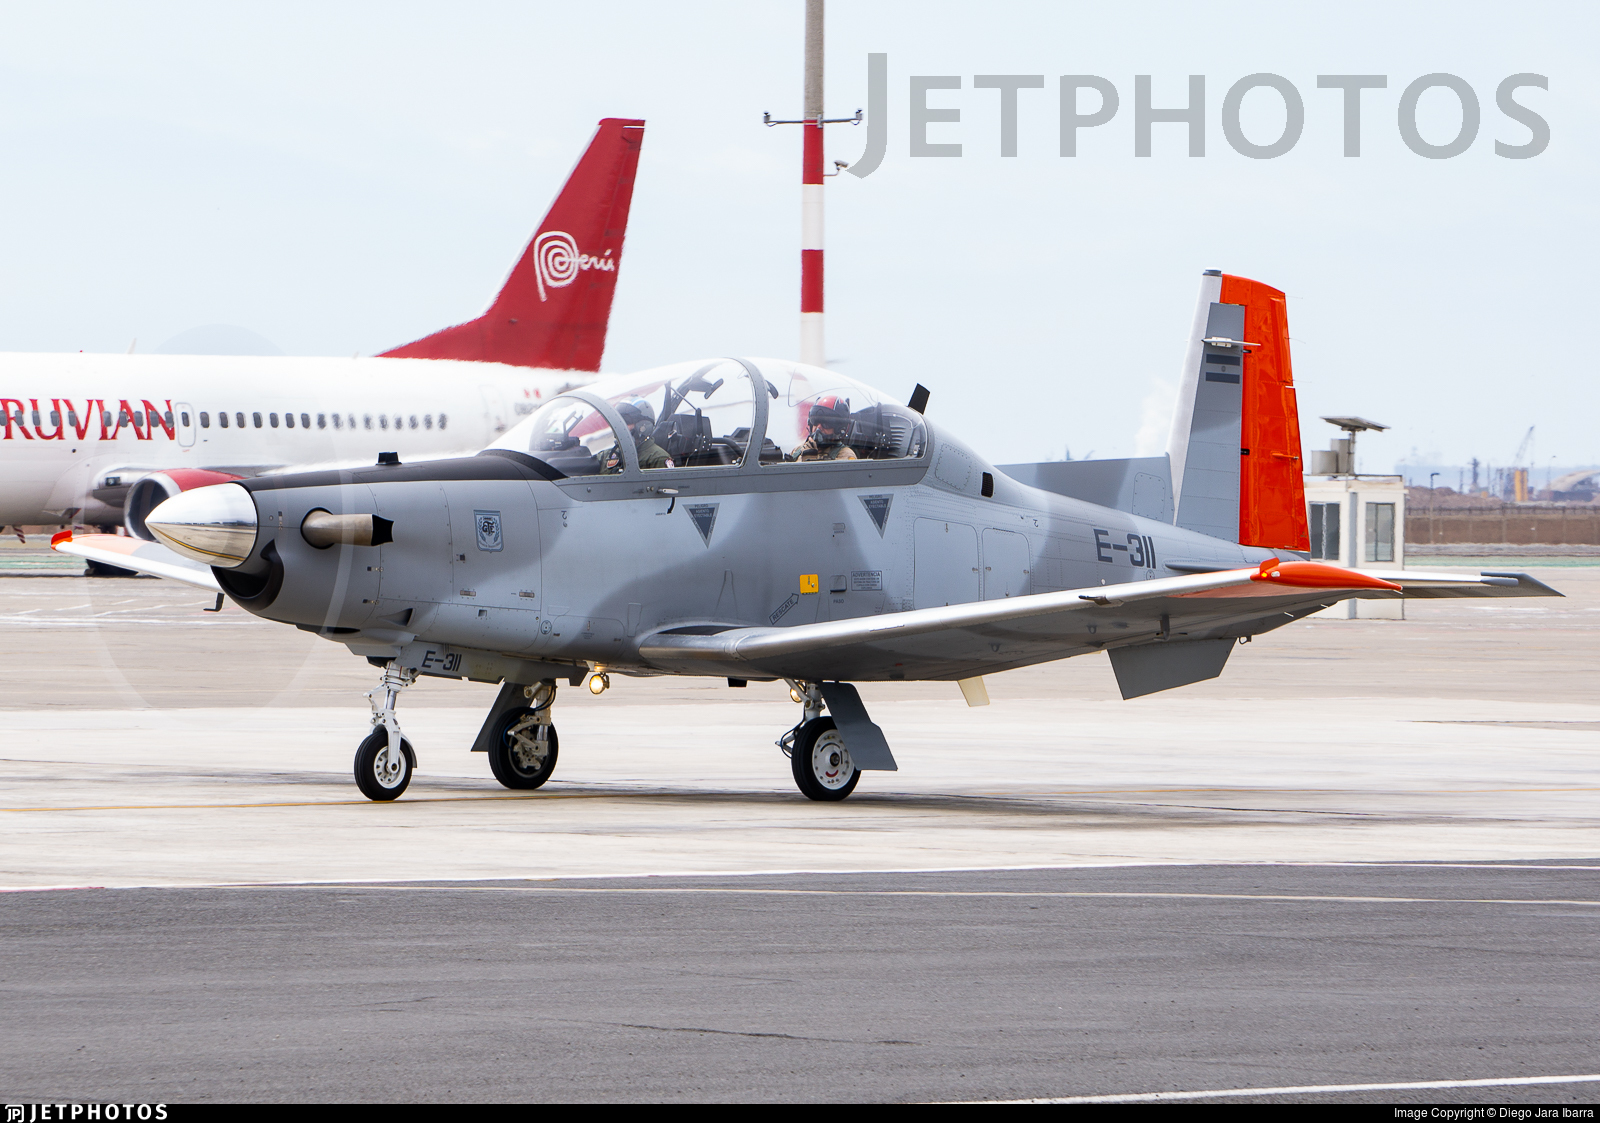 E-311 - Raytheon T-6C Texan II - Argentina - Air Force